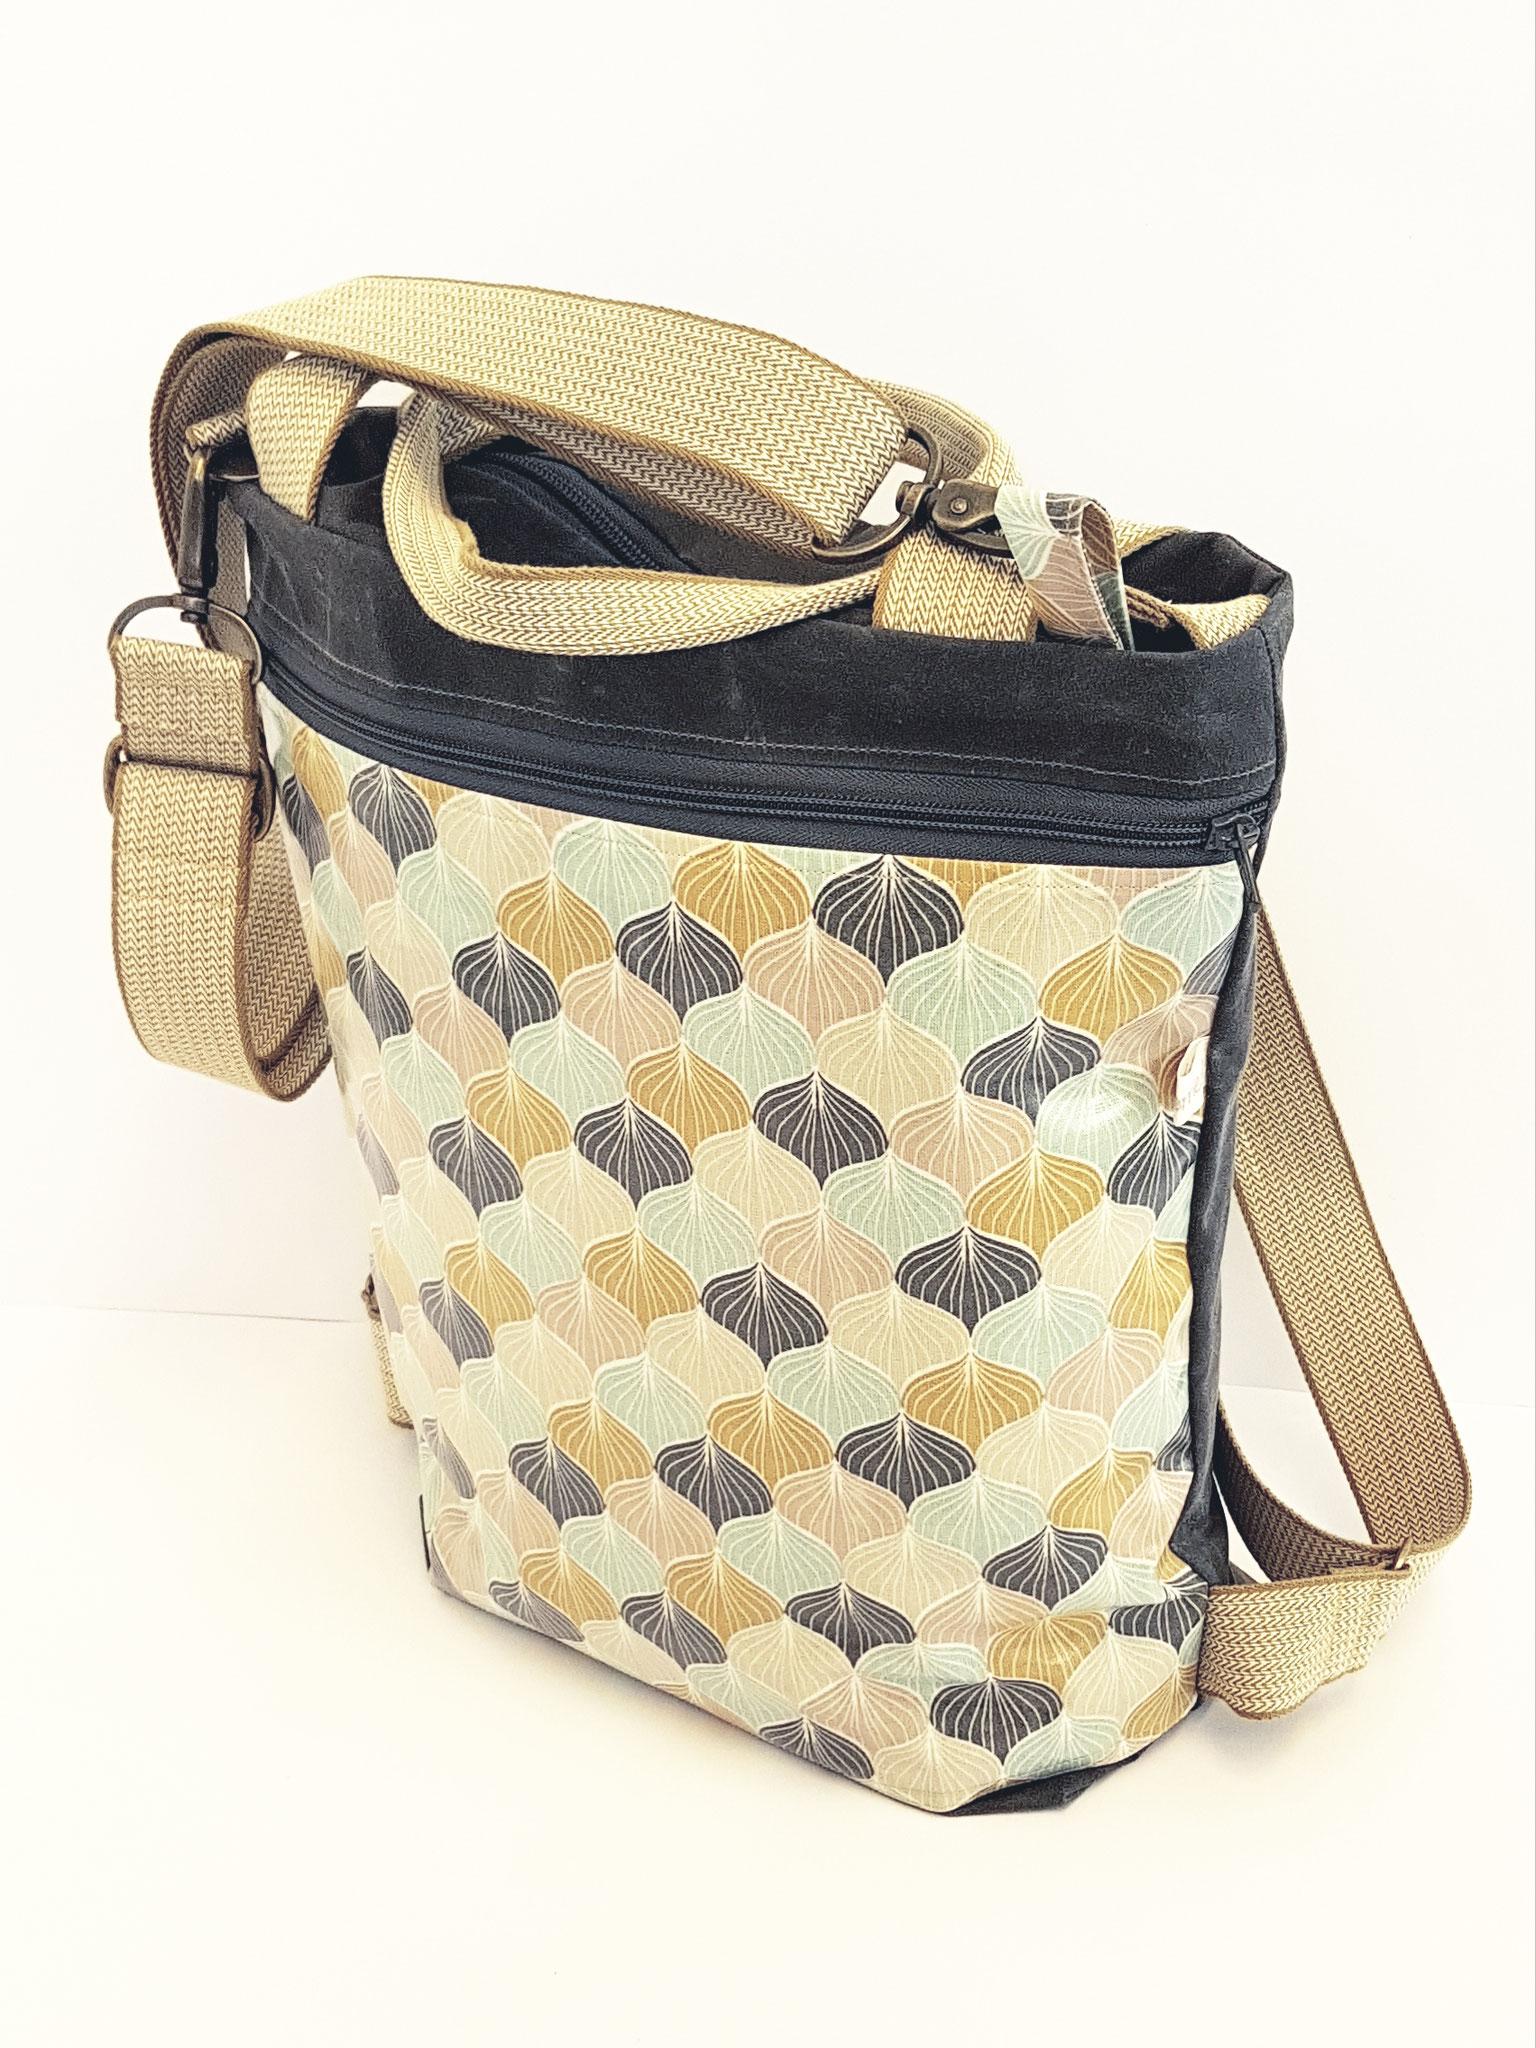 3in1 Bag Grösse L, verkauft